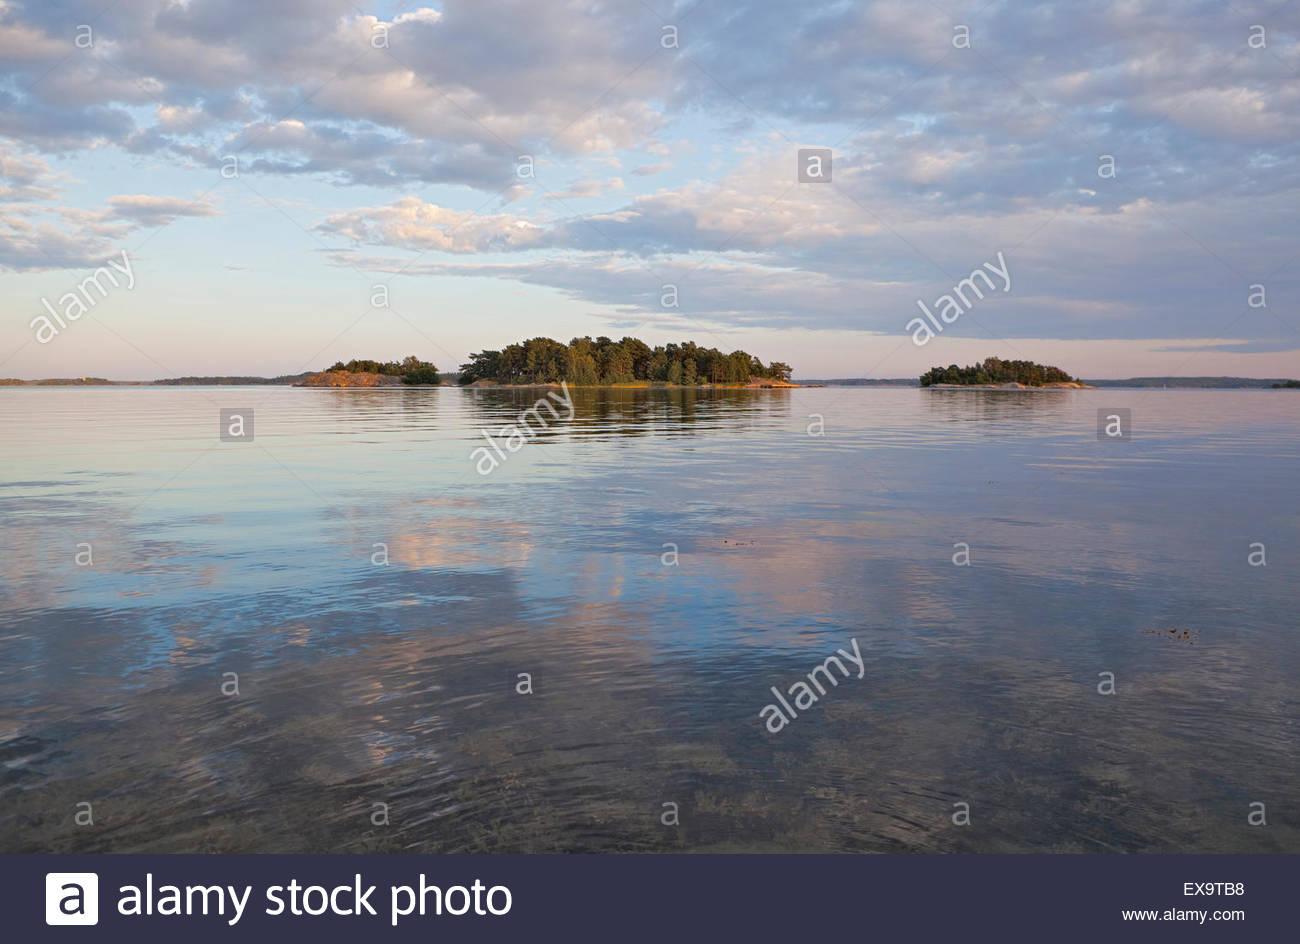 Beautiful evening in the Finnish archipelago - Stock Image